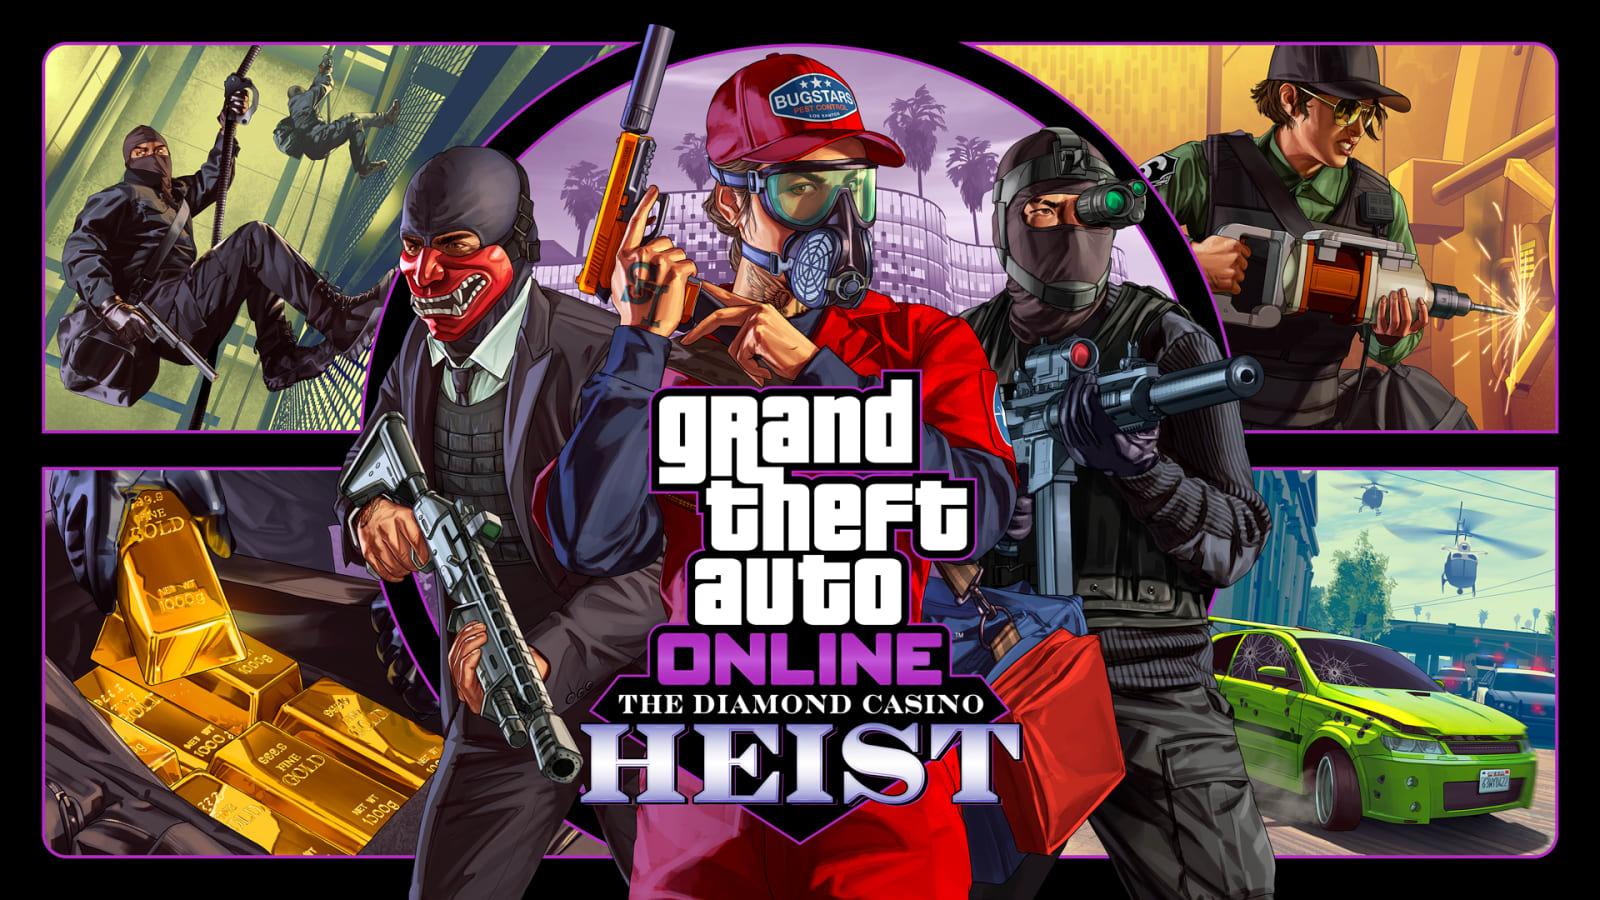 Upcoming 'GTA: Online' heist targets the Diamond Casino